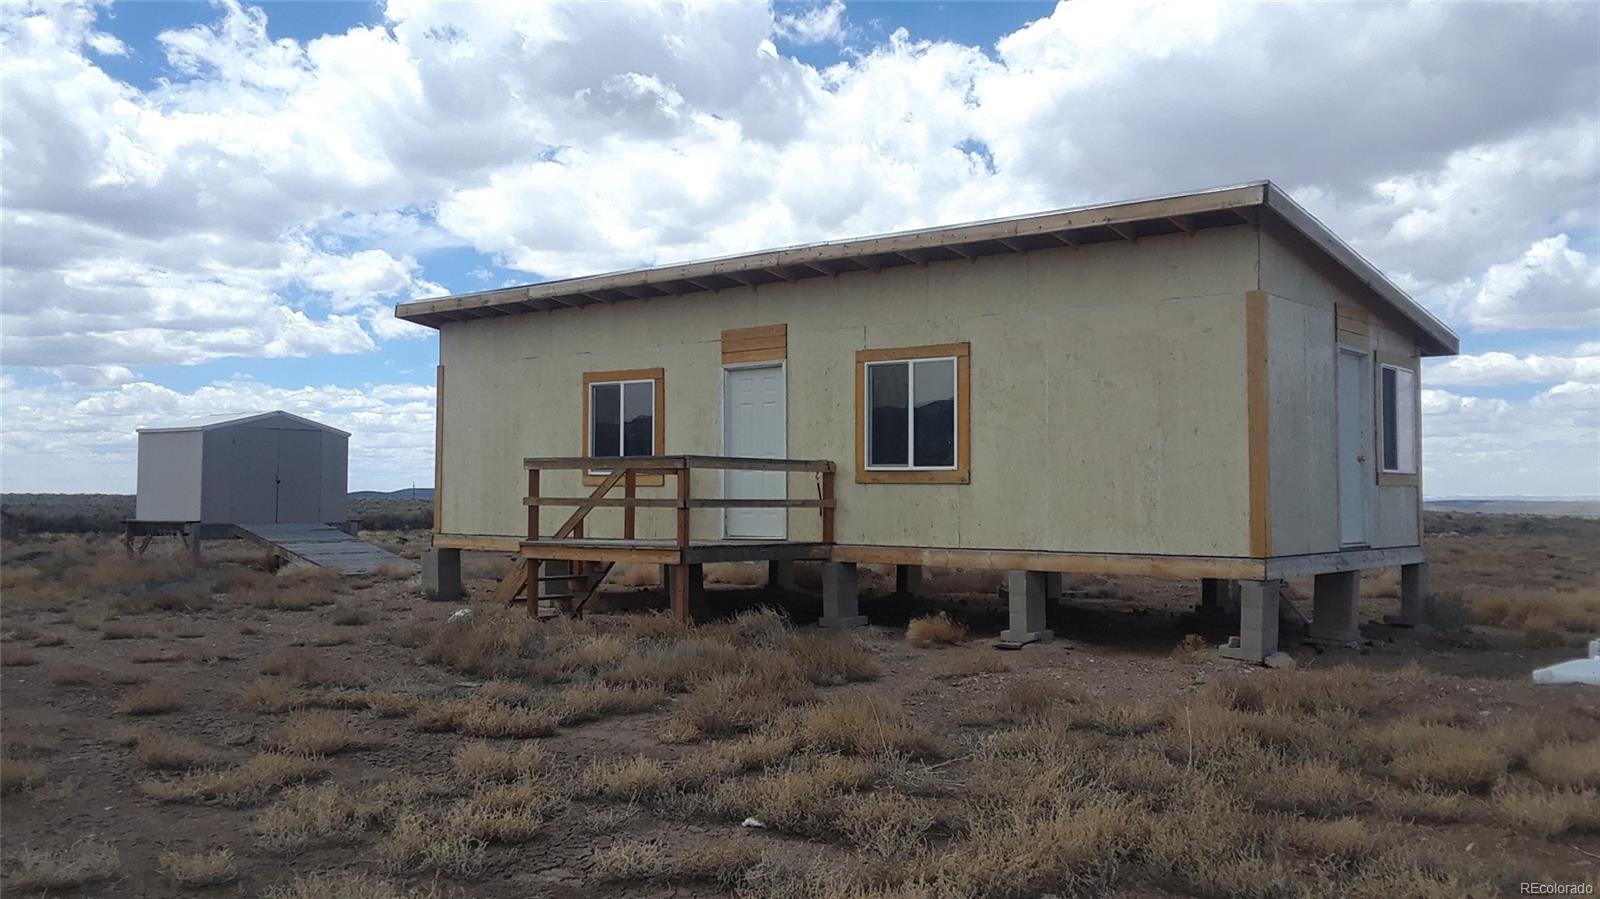 Governor Rd., Fort Garland, CO 81133 - Fort Garland, CO real estate listing